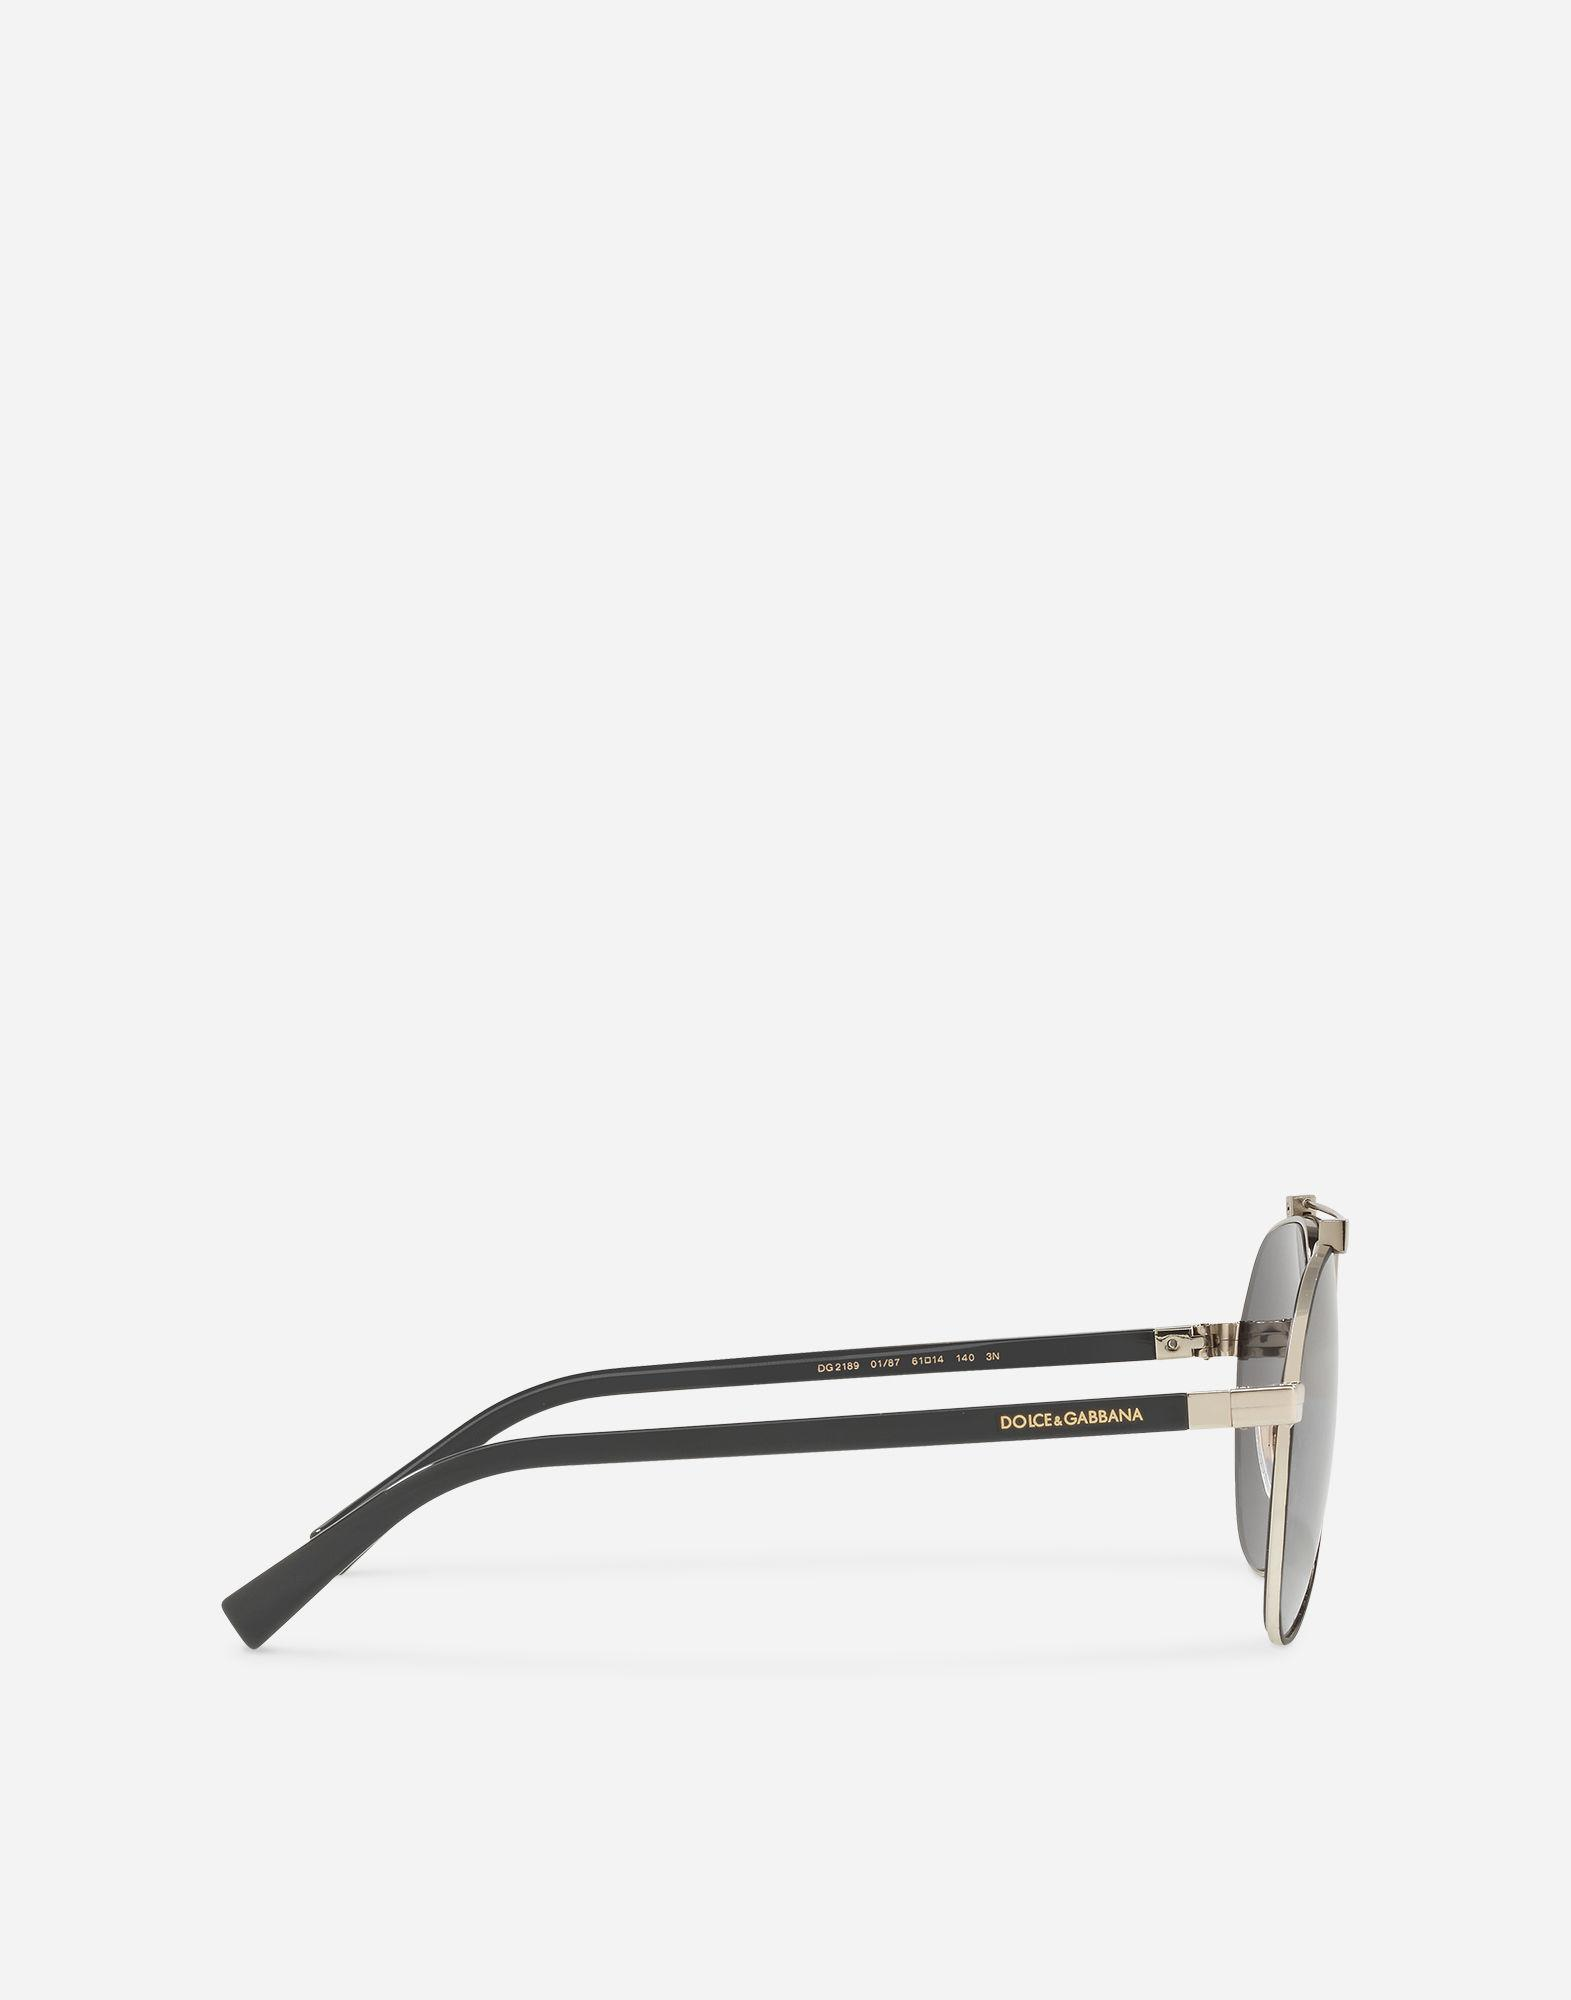 d6015471df9e Dolce & Gabbana Shiny Metal Aviator Sunglasses In Matt Black/Shiny Light  Gold